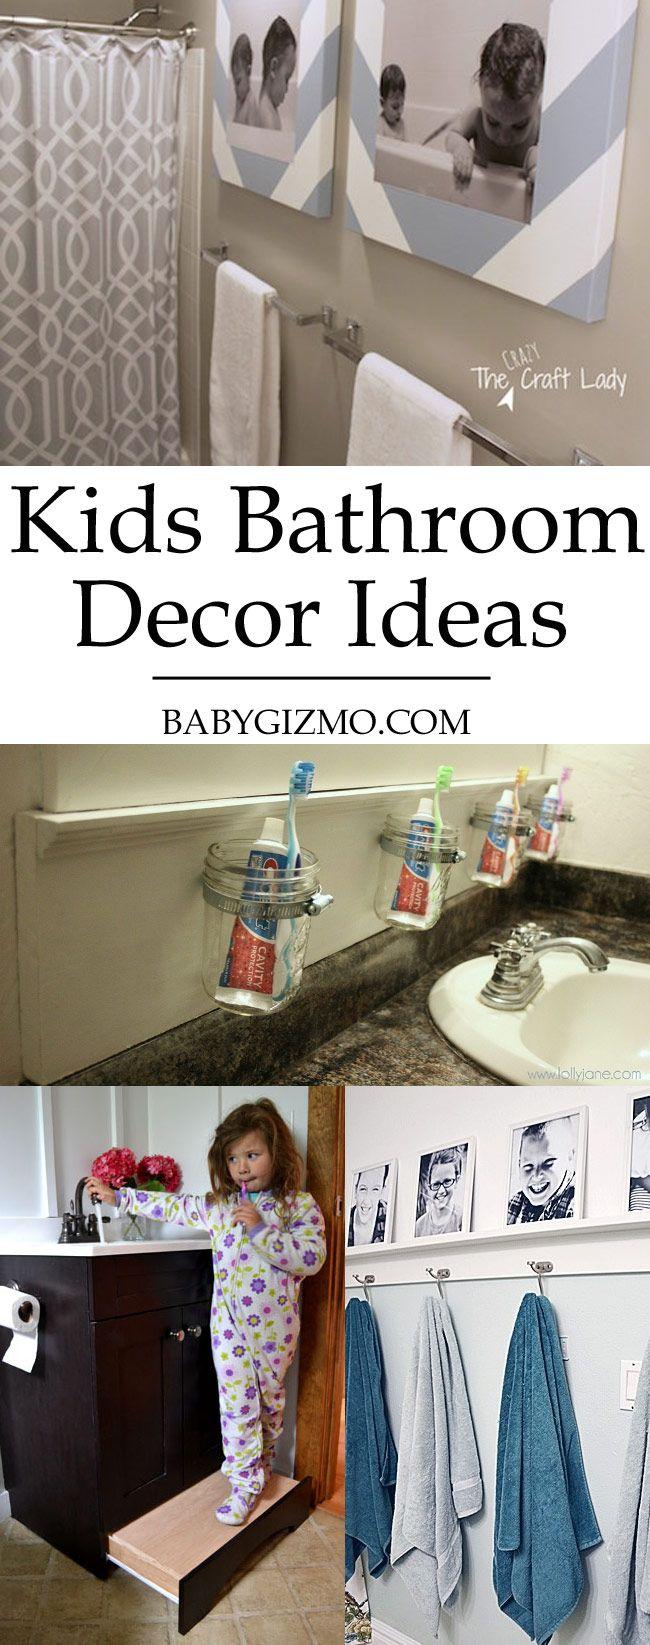 7 adorable kids bathroom decor ideas  baby gizmo company